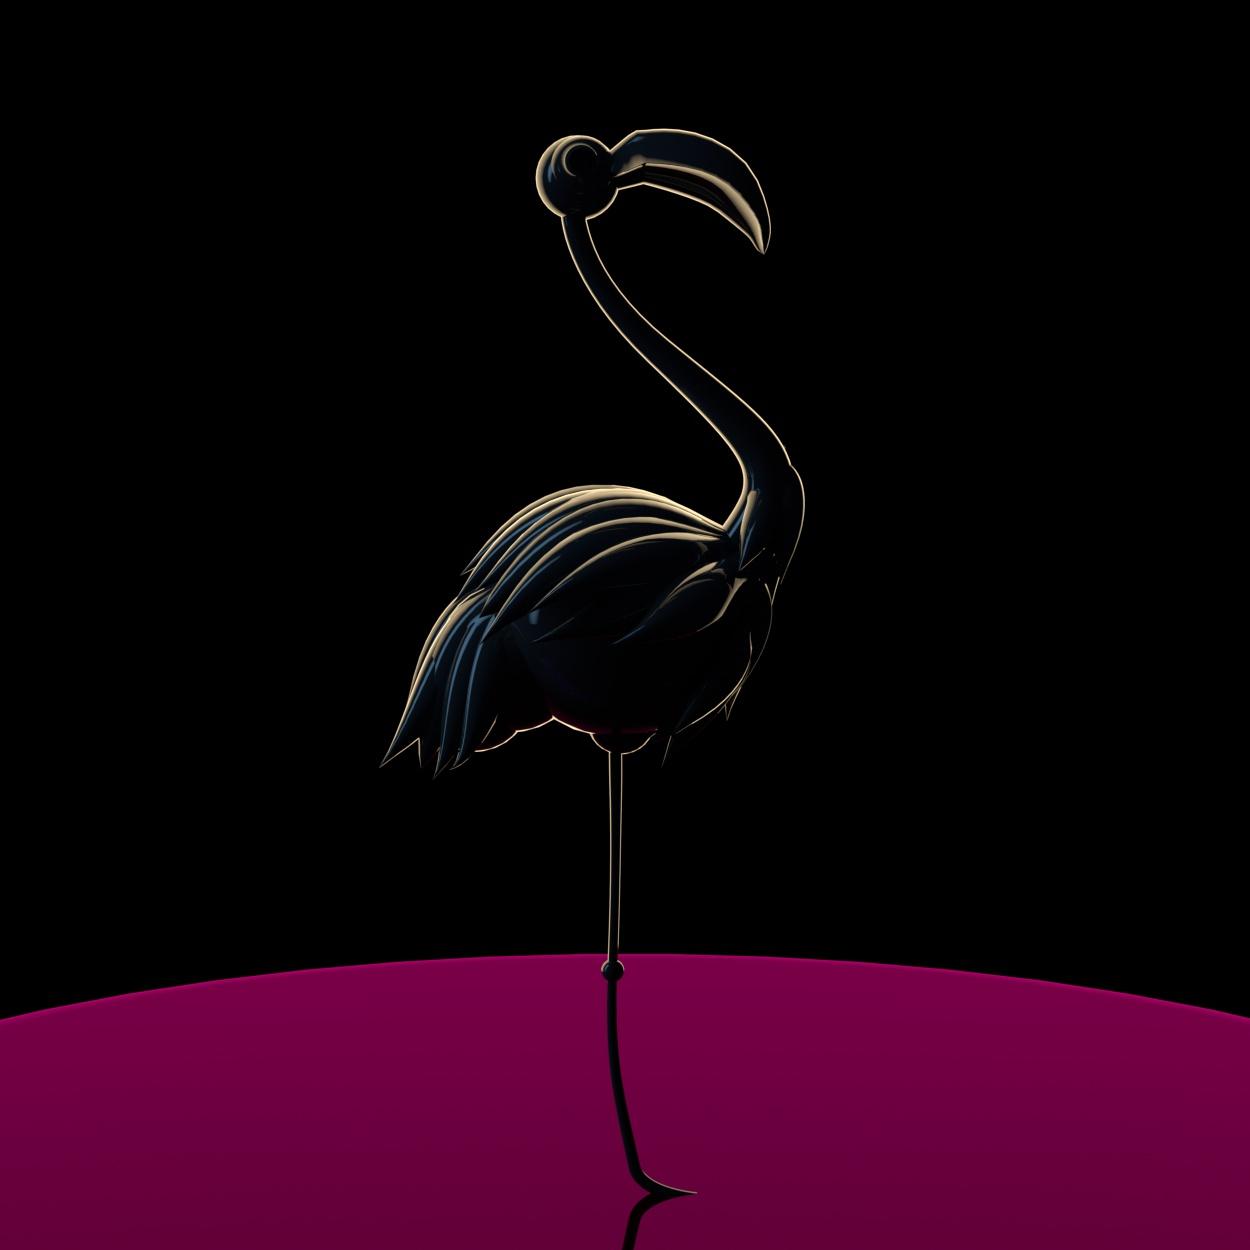 Flamingon_silhouette.jpg